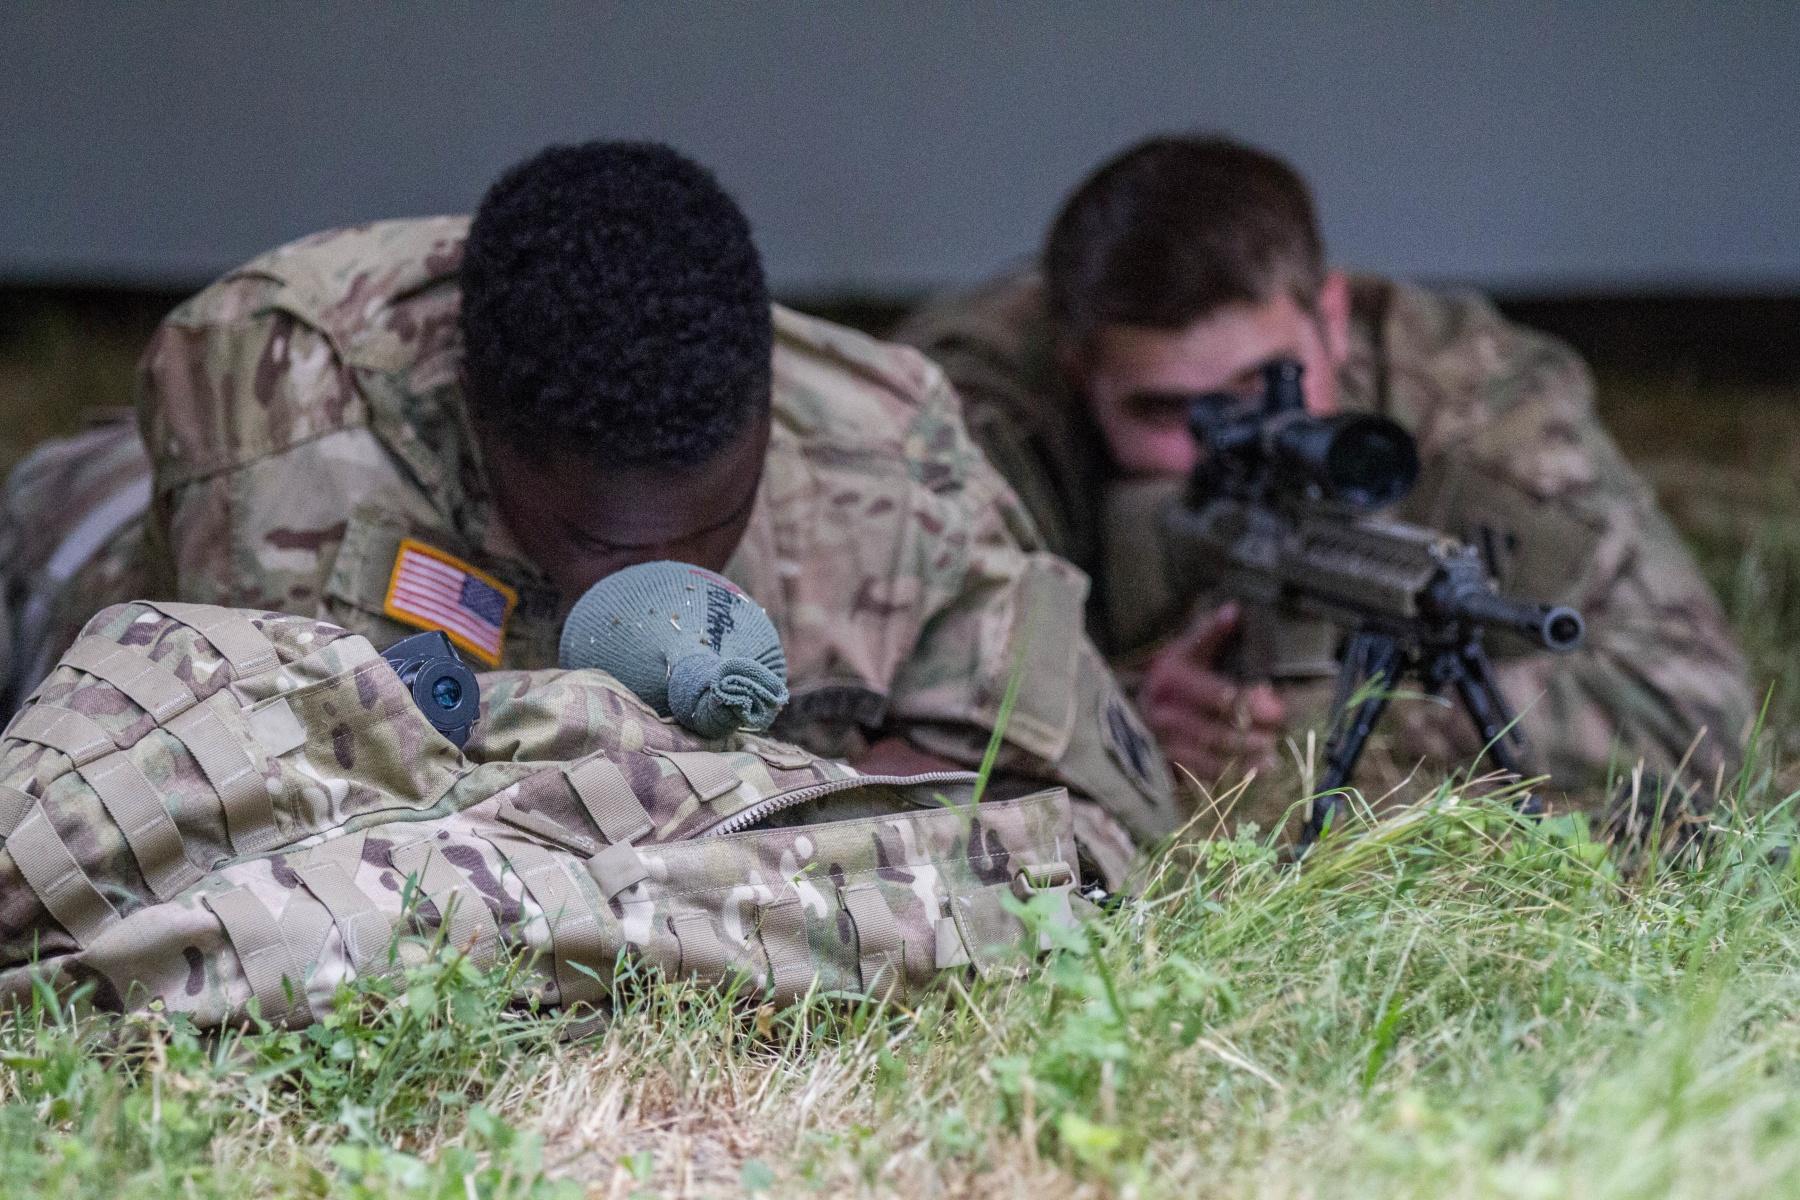 Drawn snipers army person Soldiers U Romania train ORIGINAL